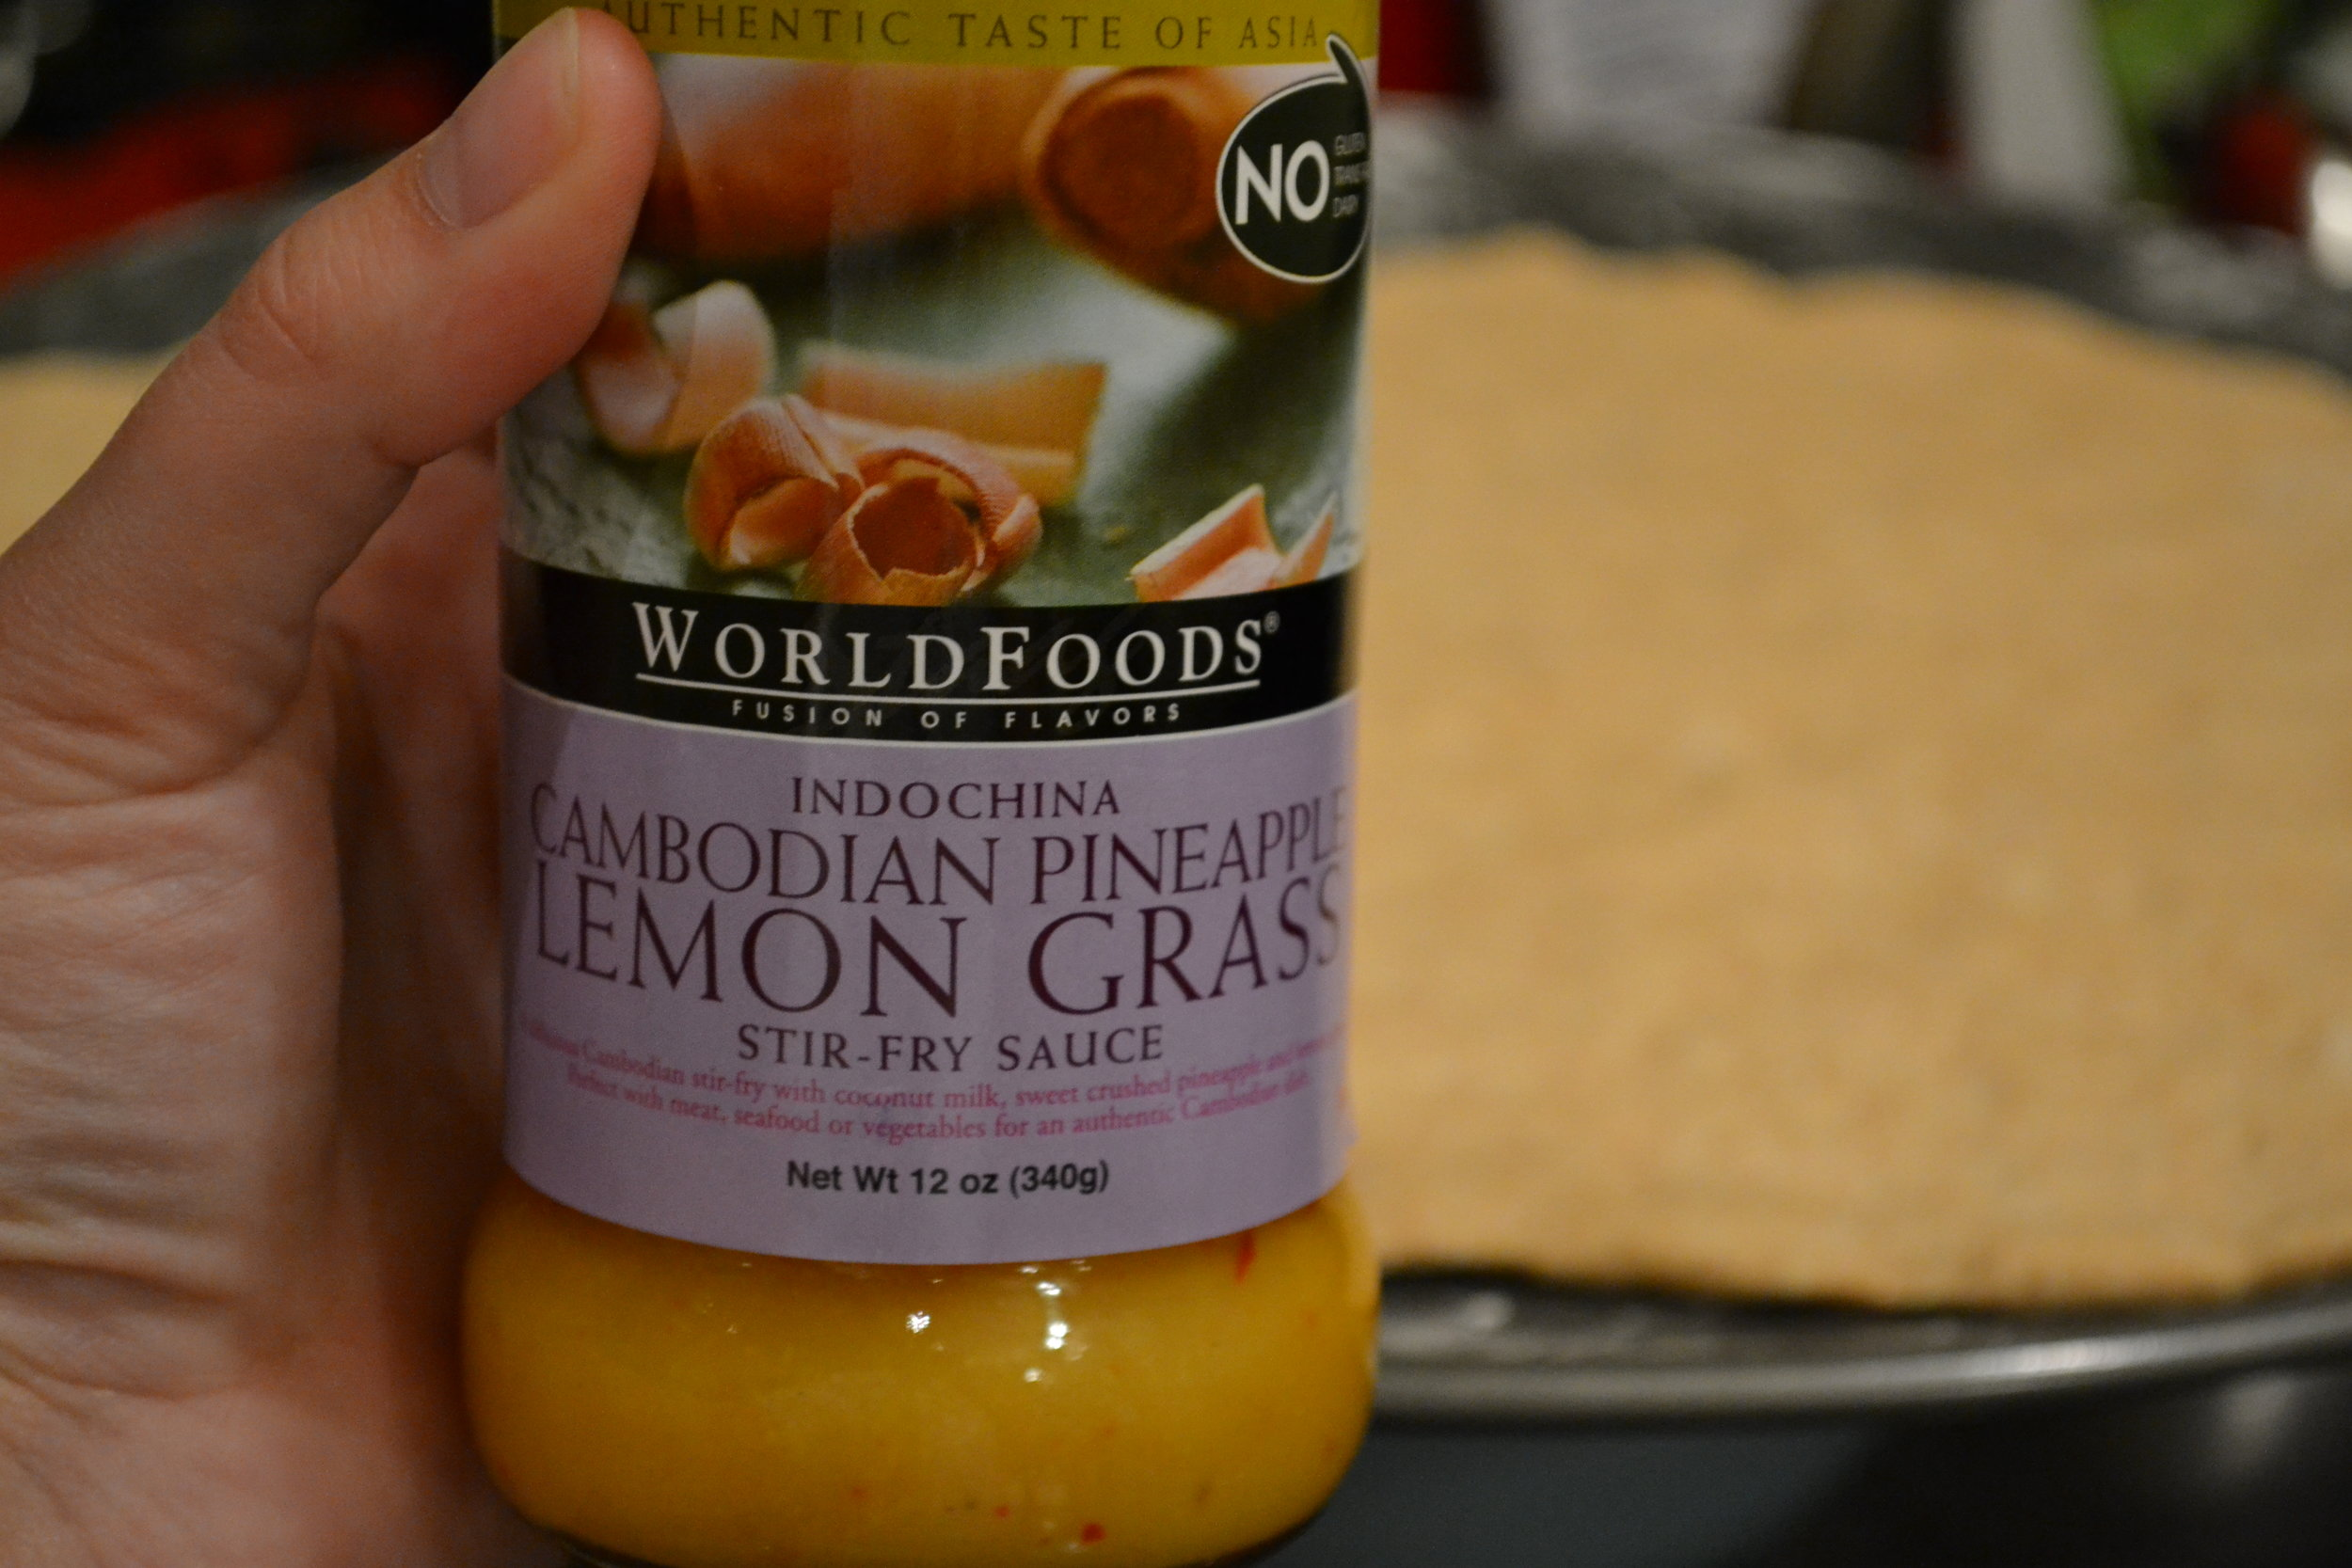 WorldFoods Pineapple Lemon Grass Sauce